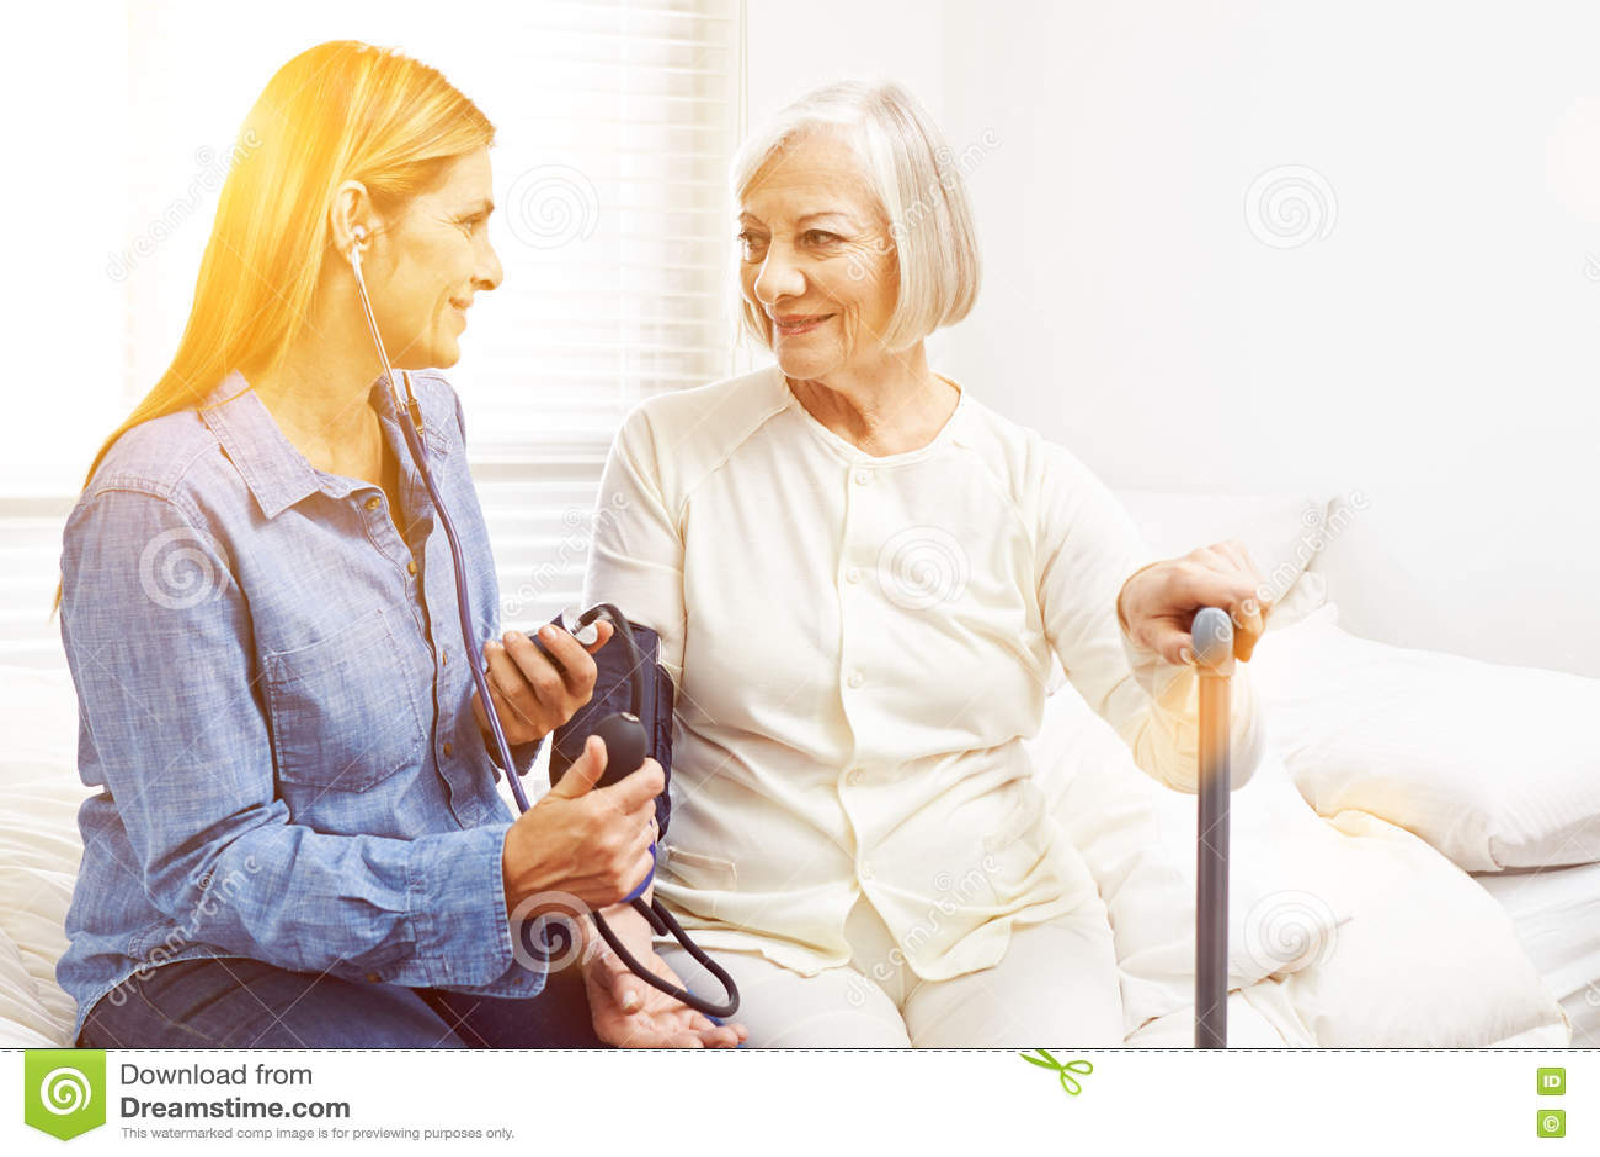 Blood pressure monitoring in nursing home